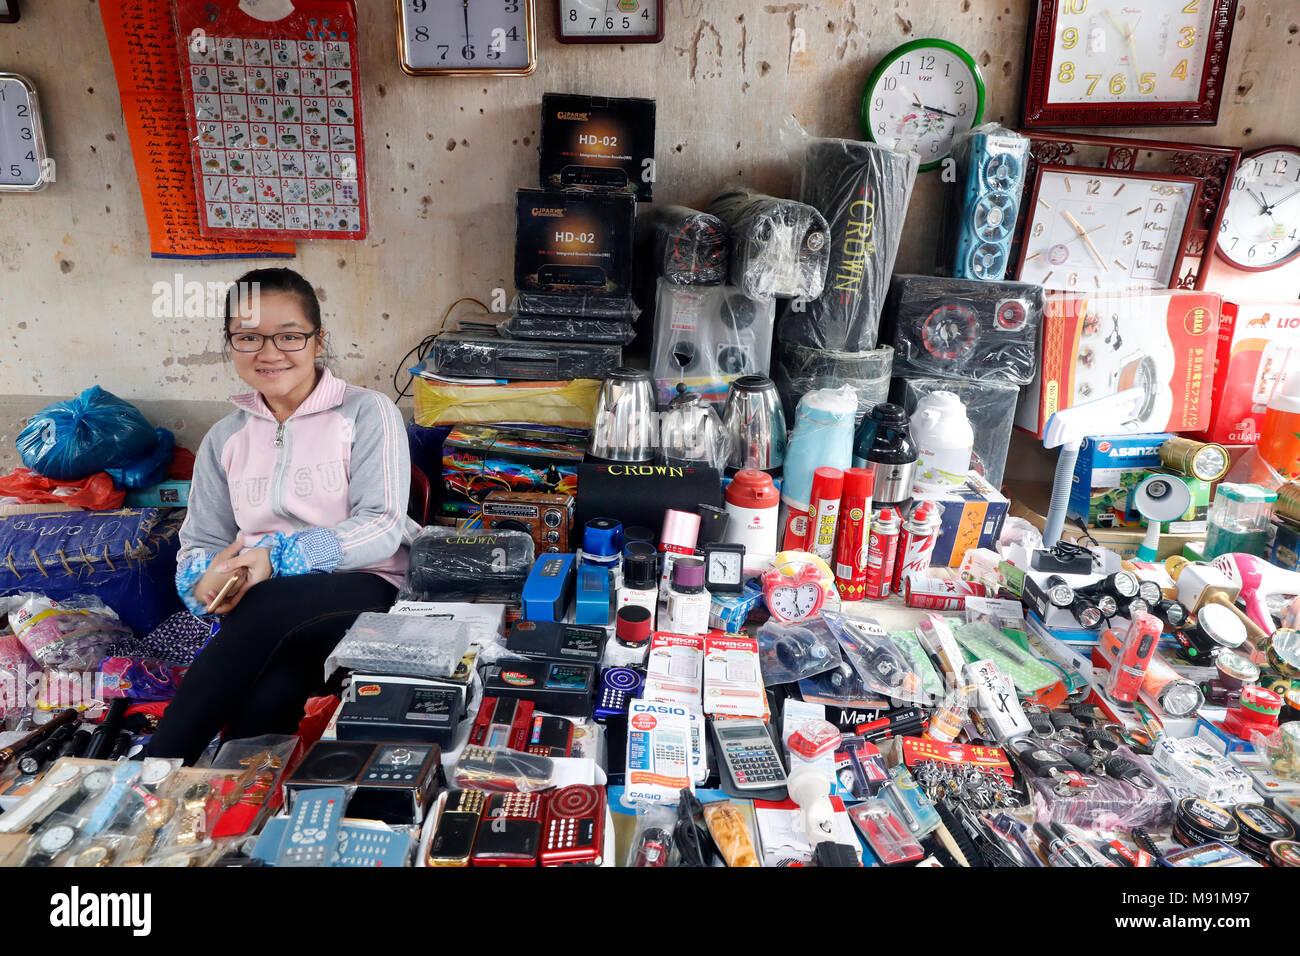 Stalls selling electronics in Van Quan market.  Van Quan. Vietnam. - Stock Image